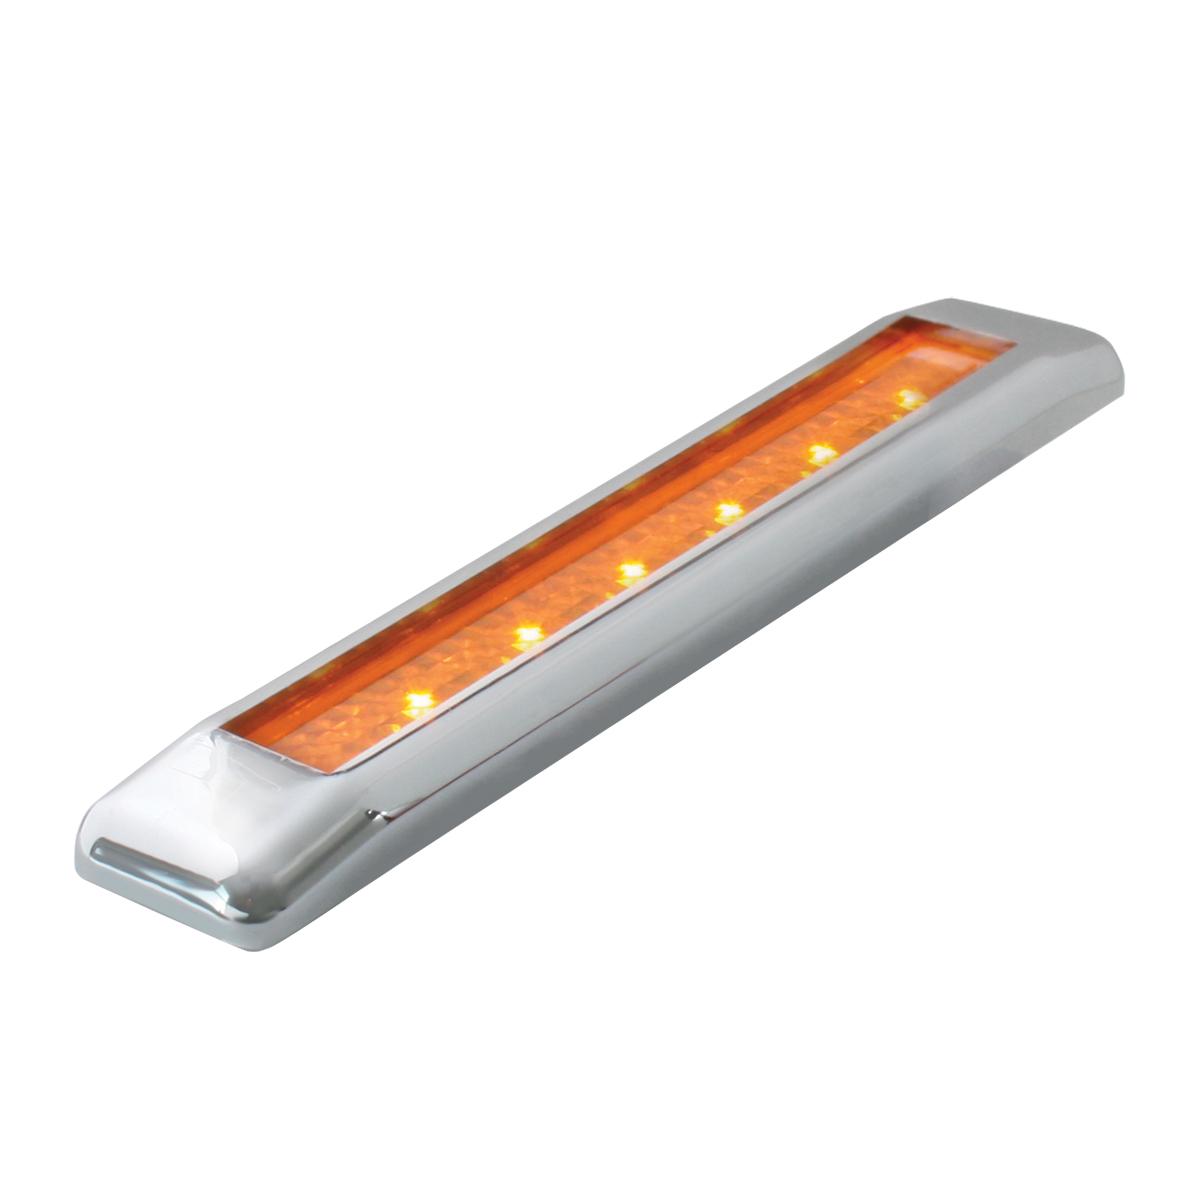 "76040 6.25"" Ultra Thin LED Marker Light Bar in Amber/Amber"